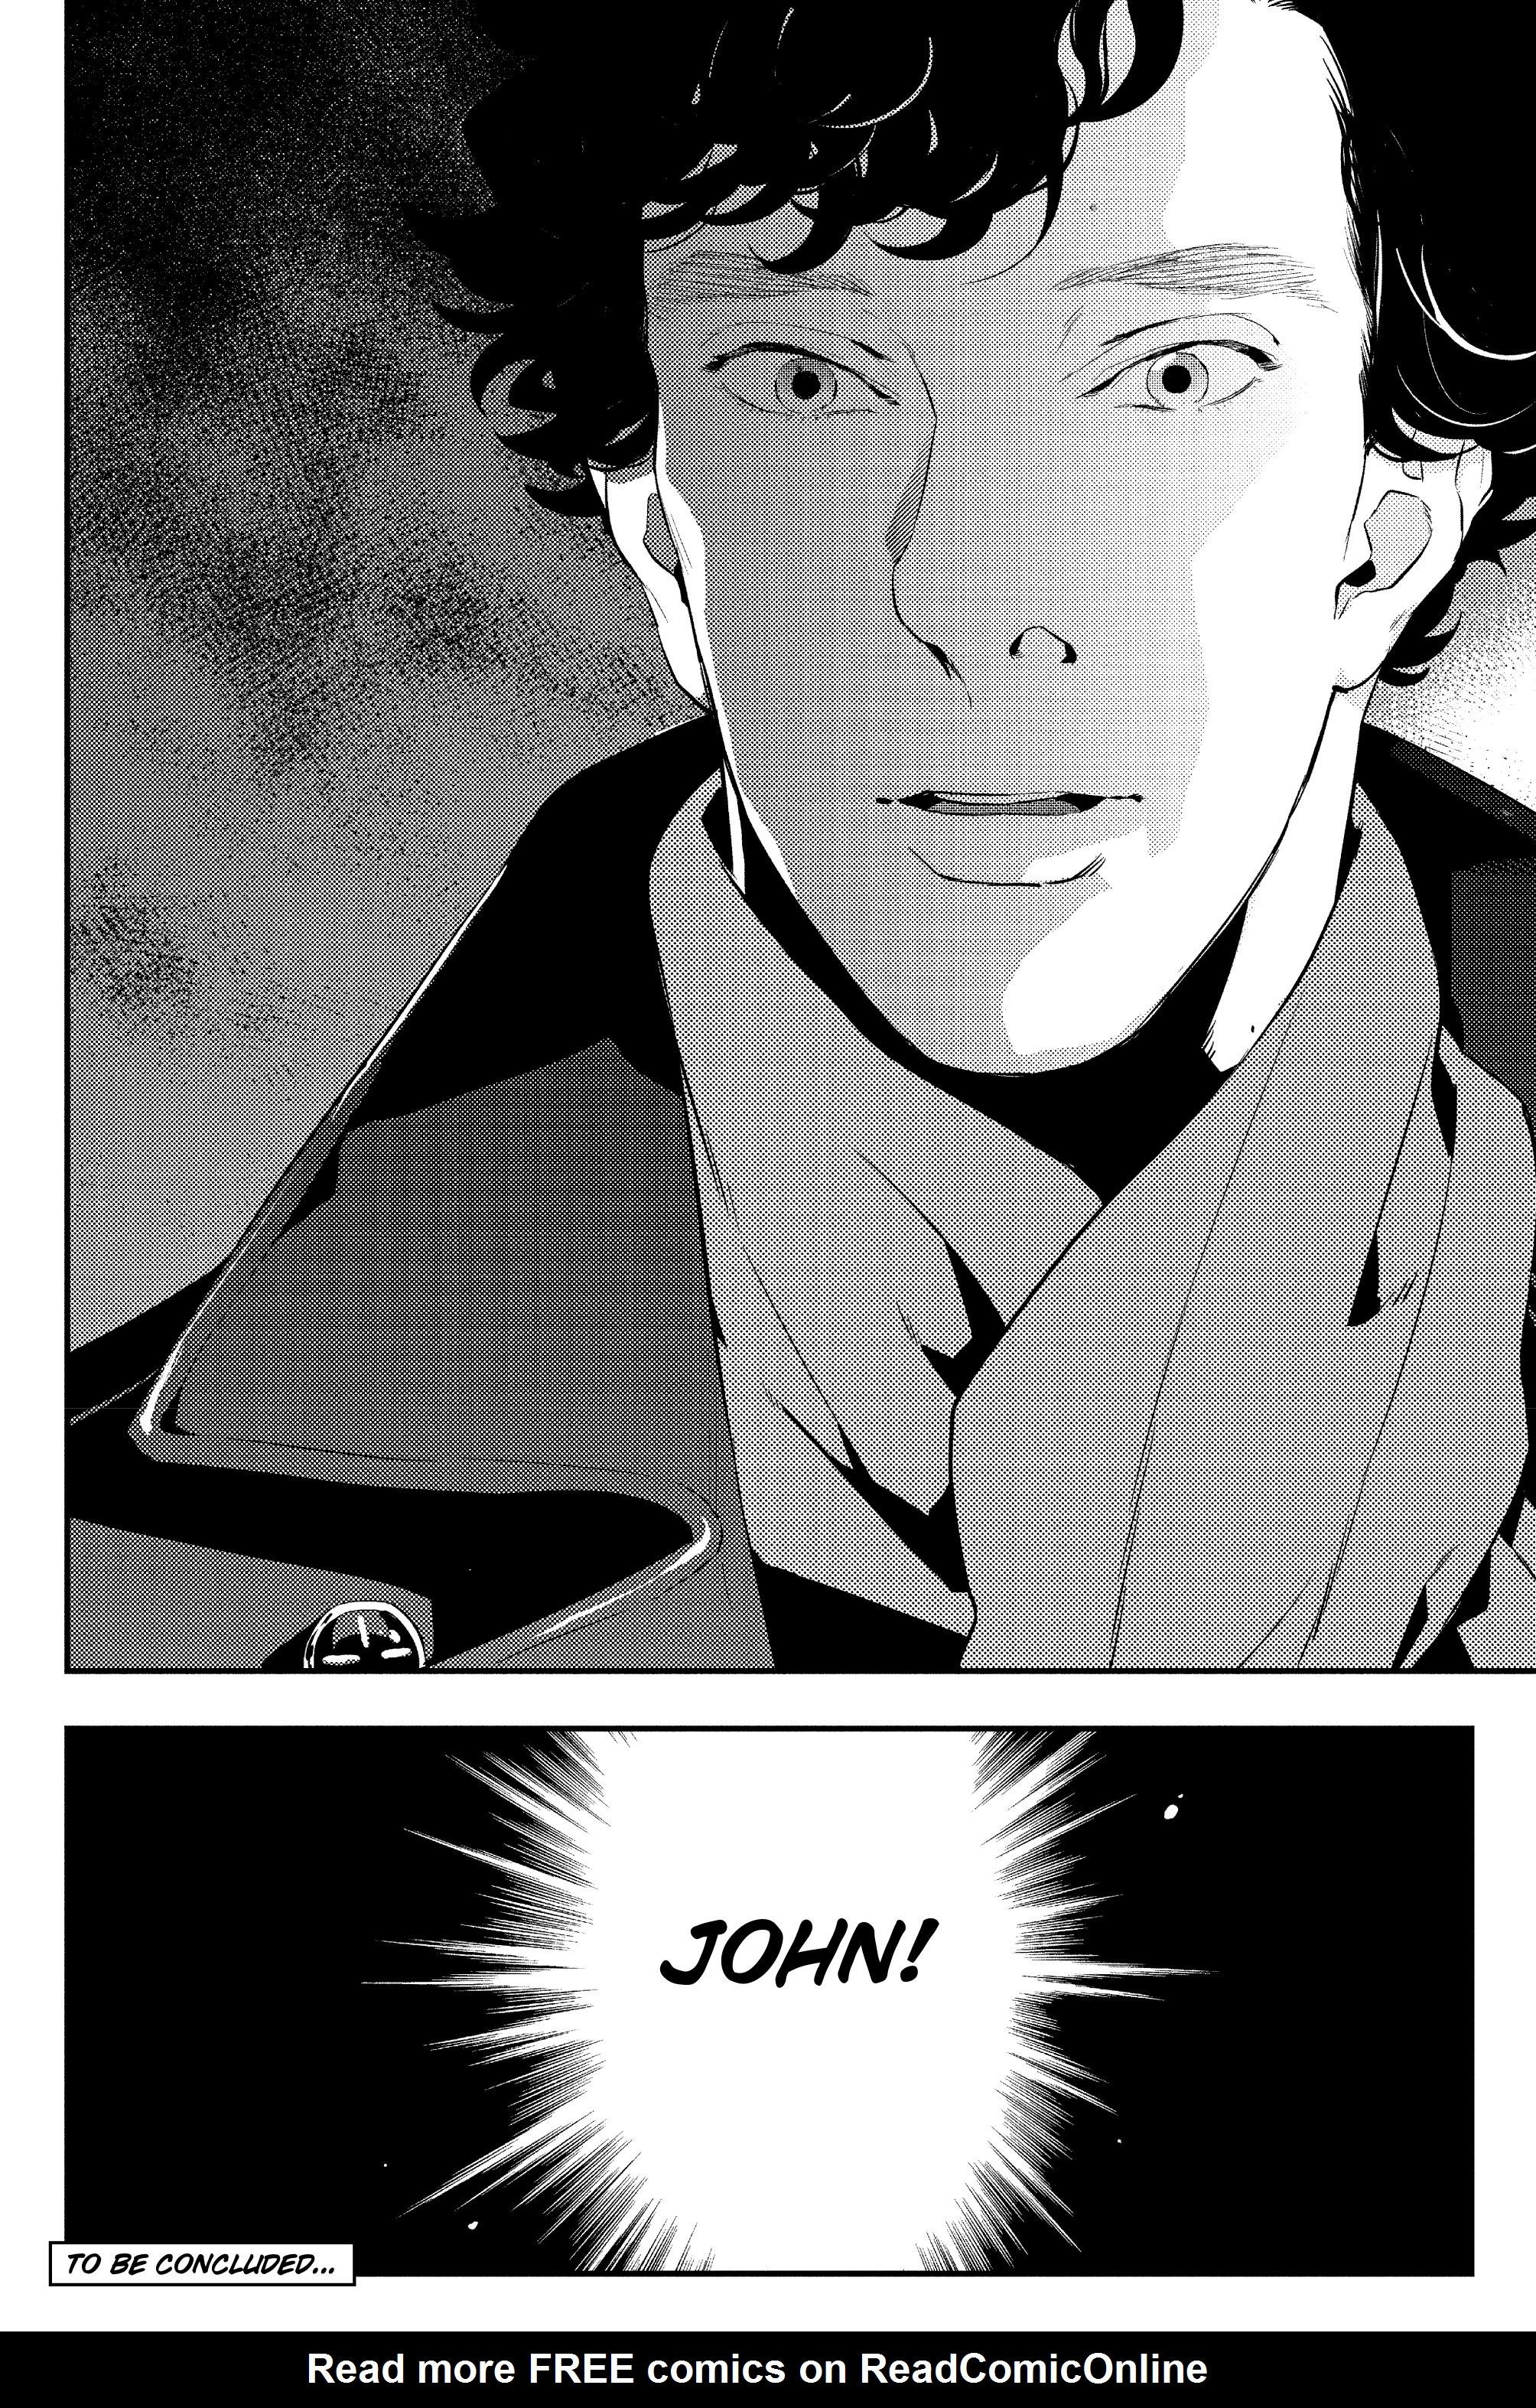 Read online Sherlock: The Blind Banker comic -  Issue #5 - 39